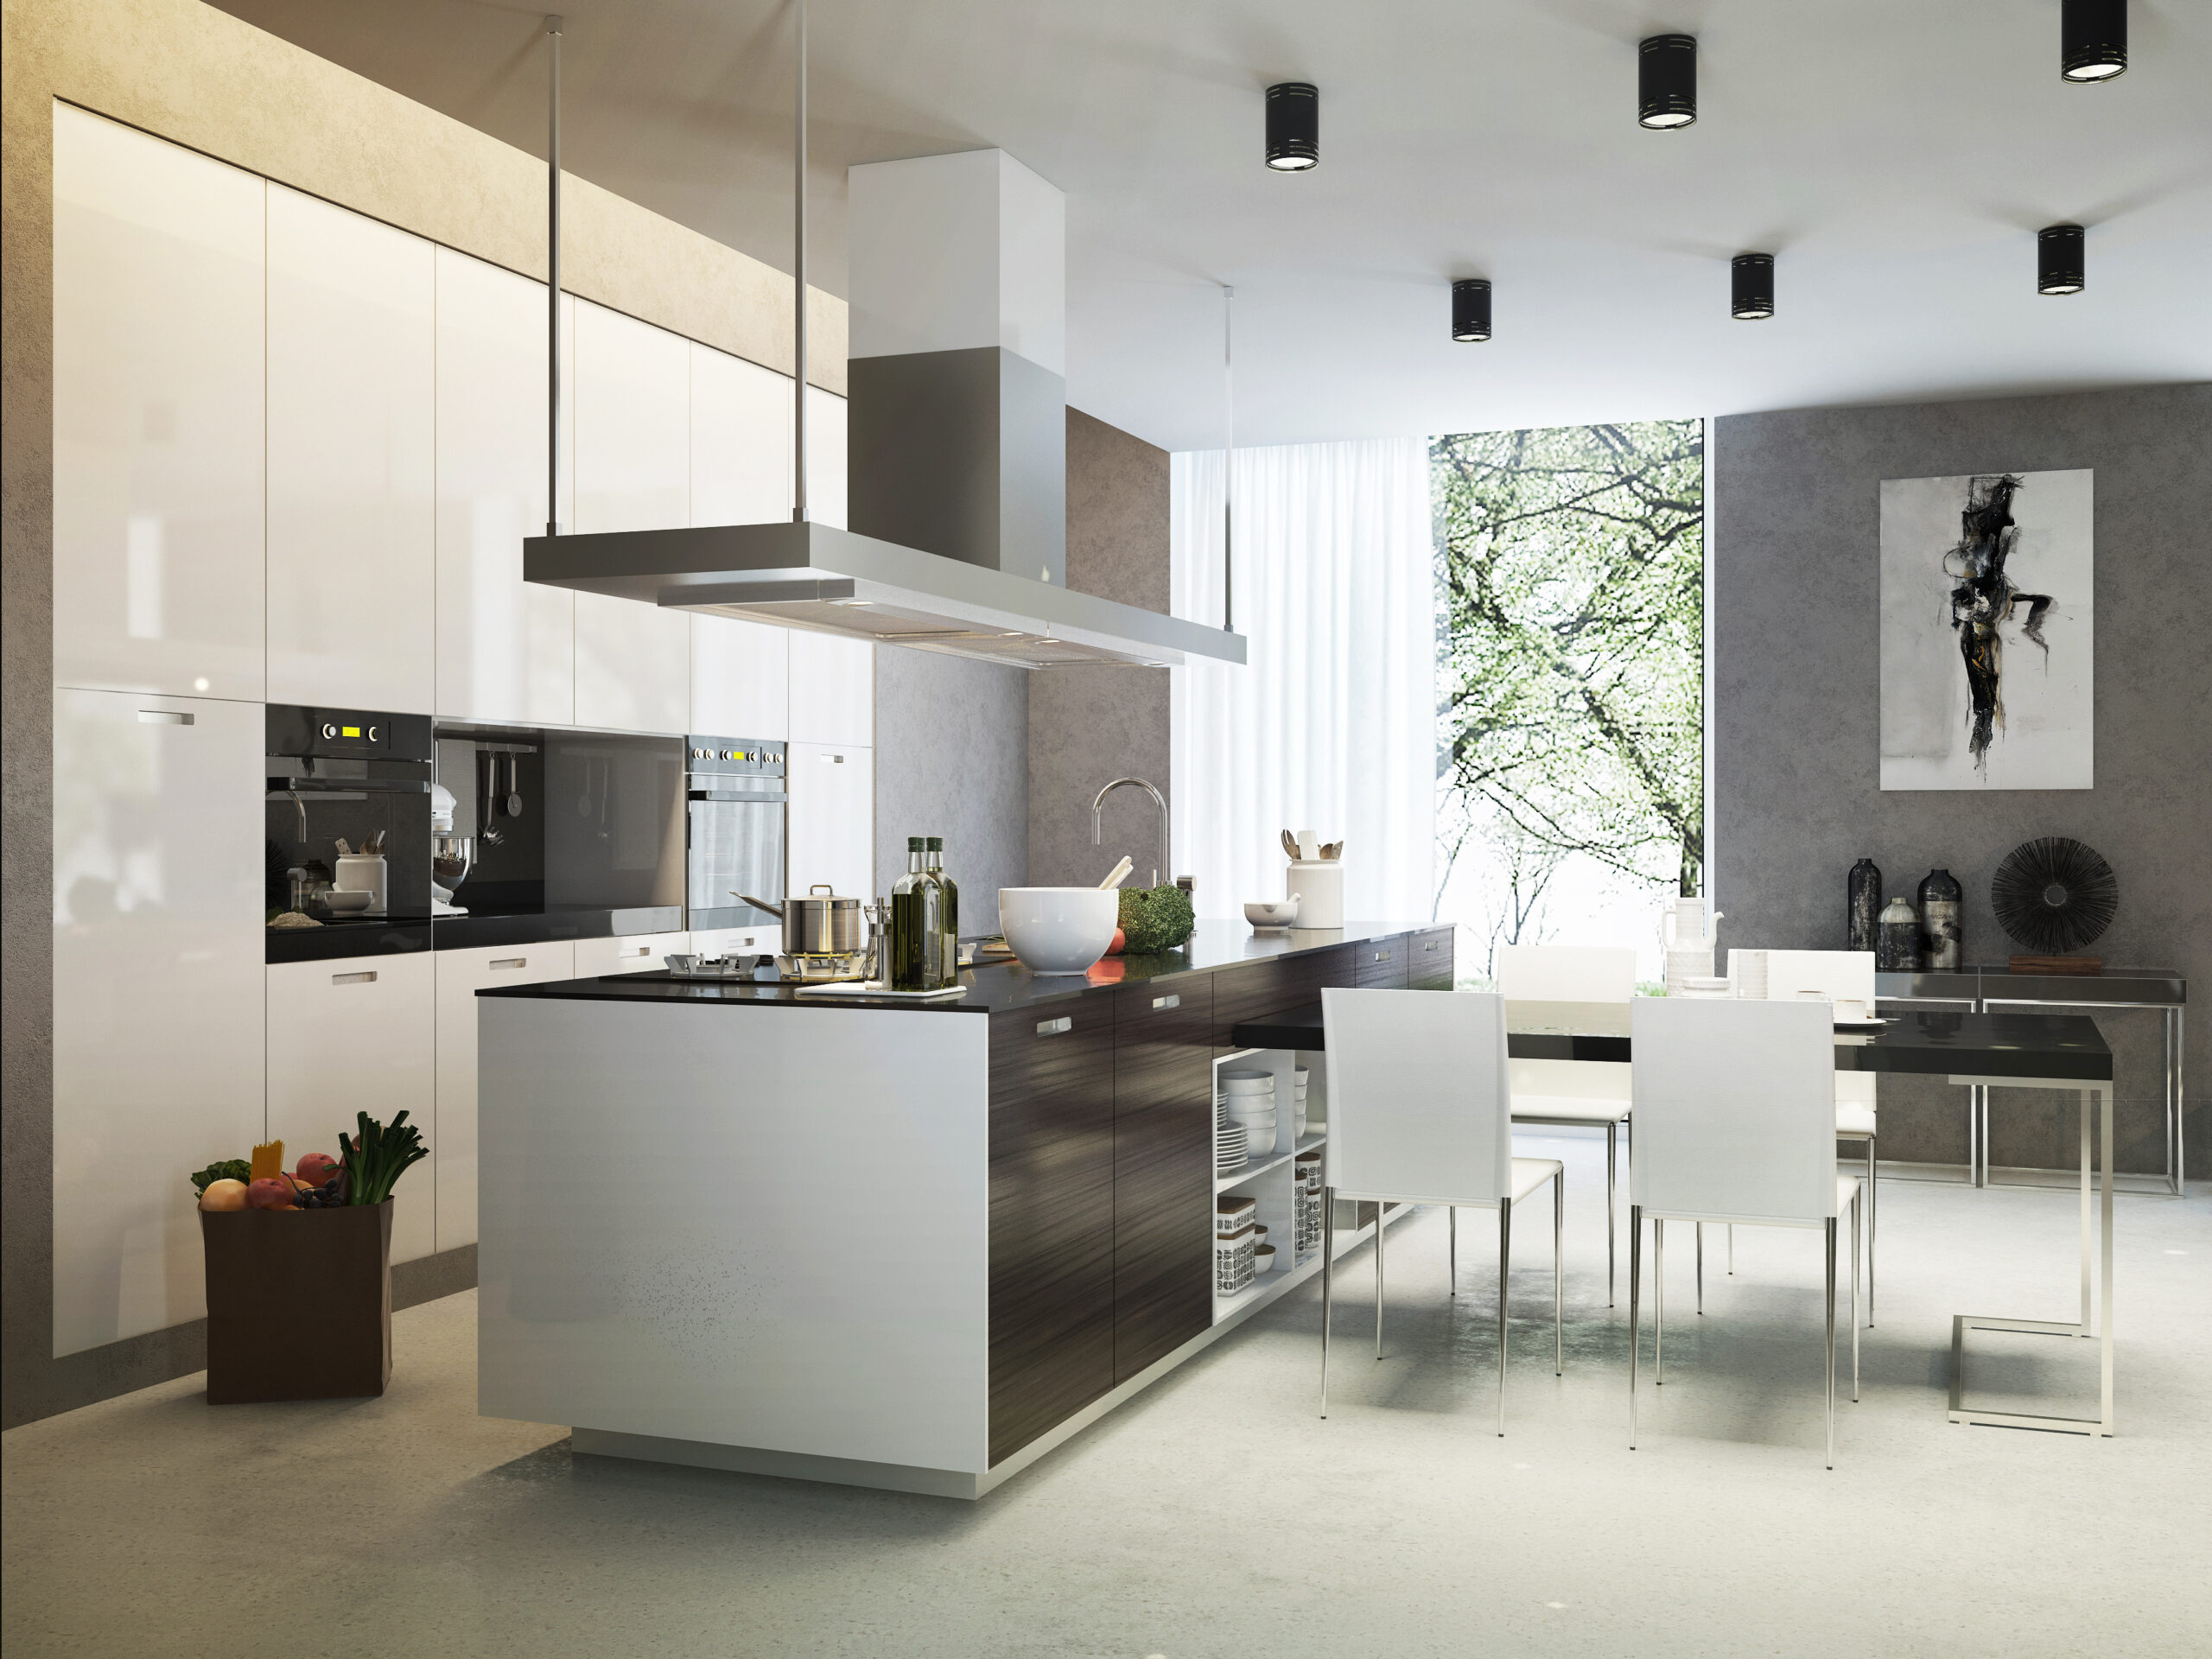 Kitchen 2 scaled